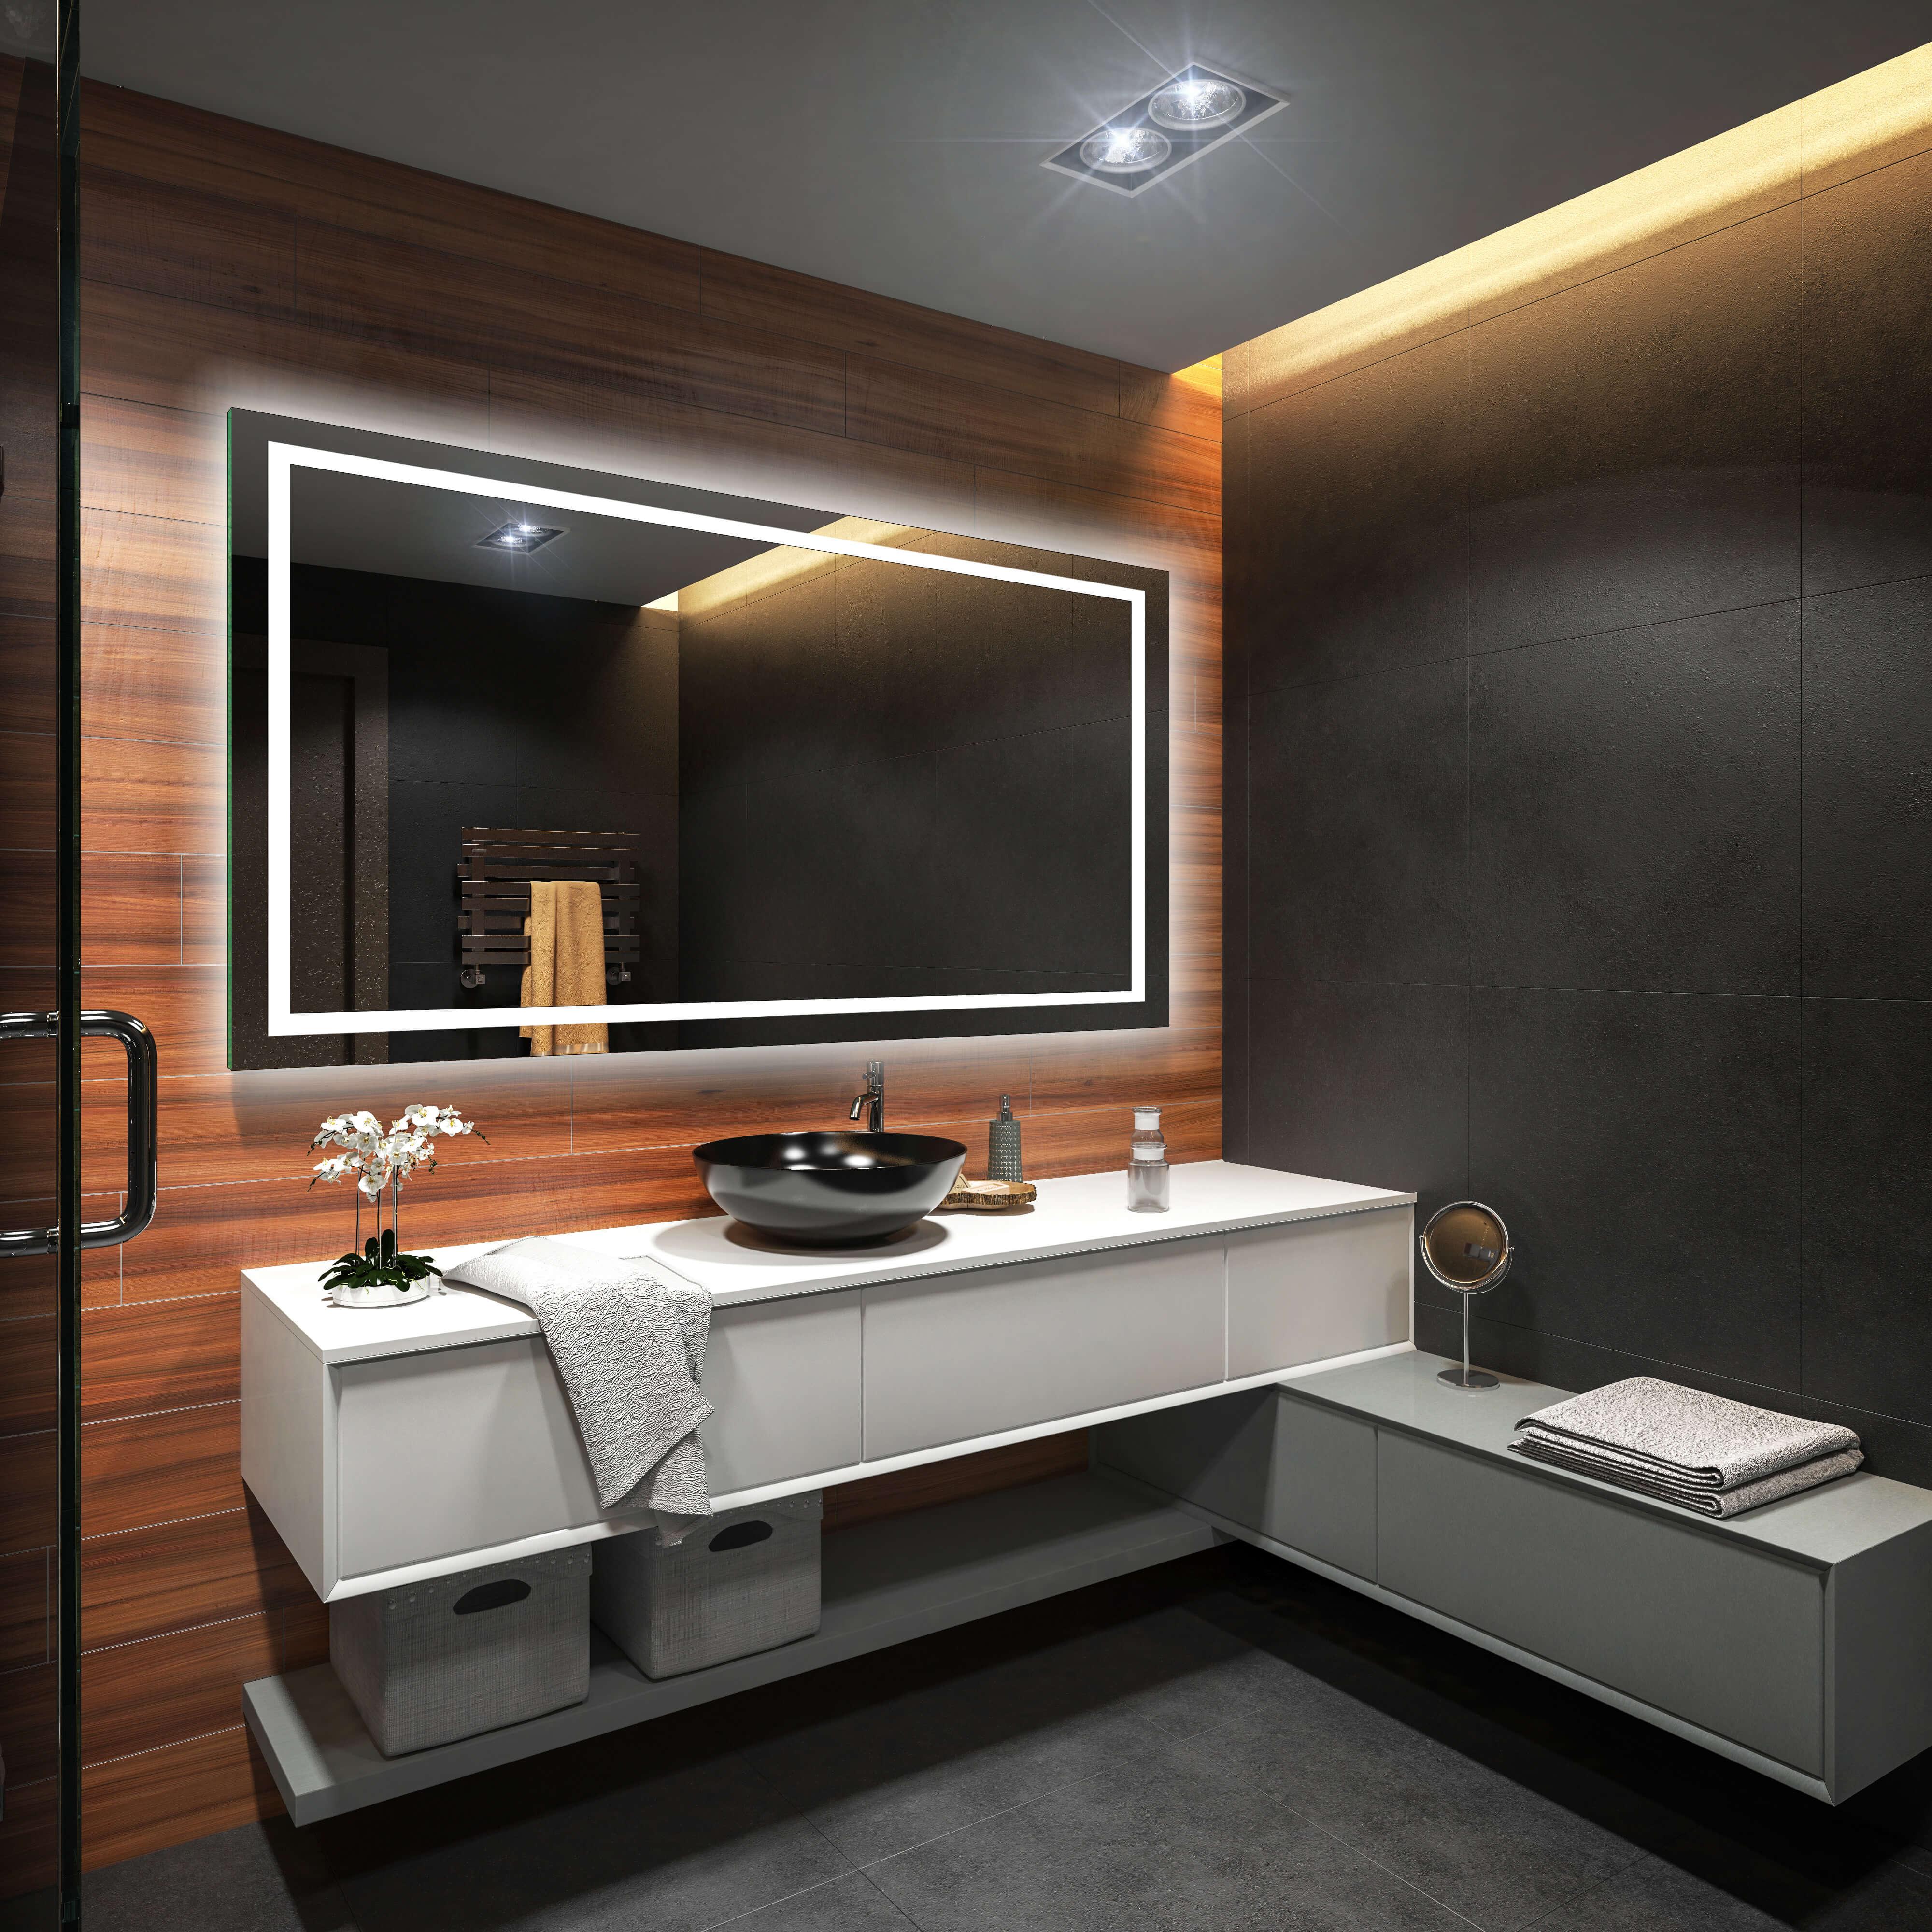 illumination led miroir sur mesure eclairage salle de bain l15 ebay. Black Bedroom Furniture Sets. Home Design Ideas